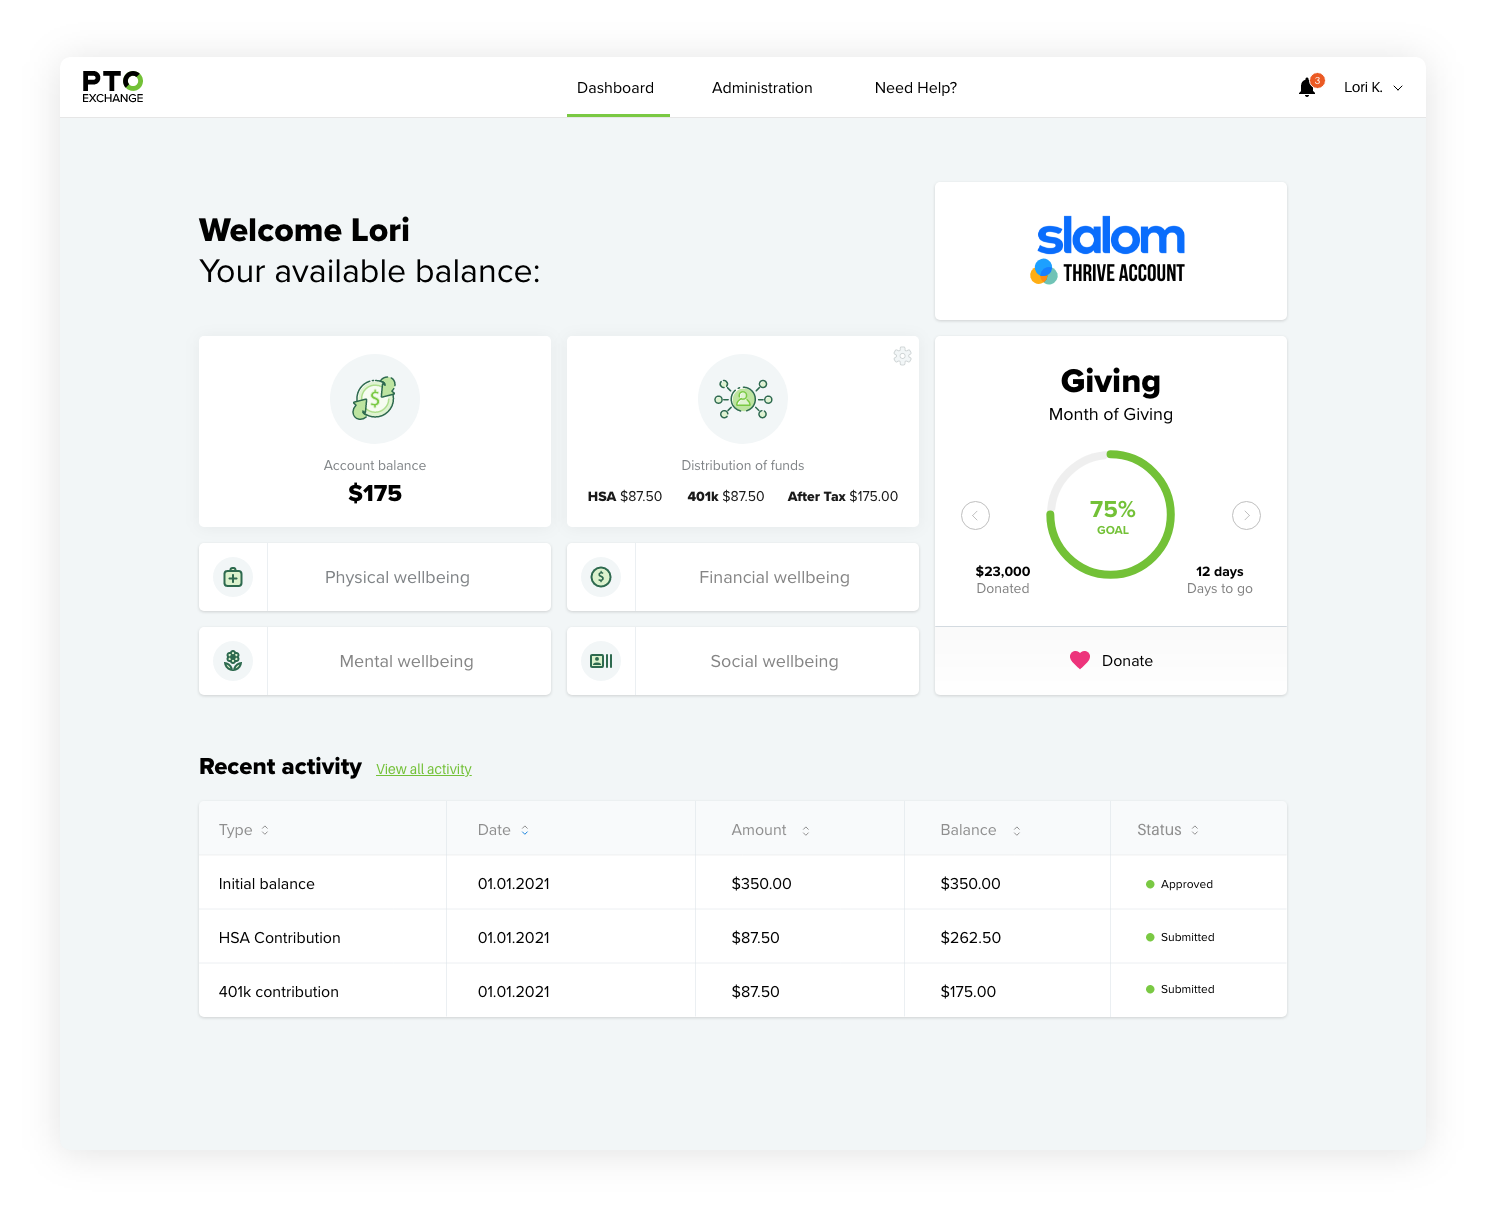 life-planning-account-dashboard-pto-exchange